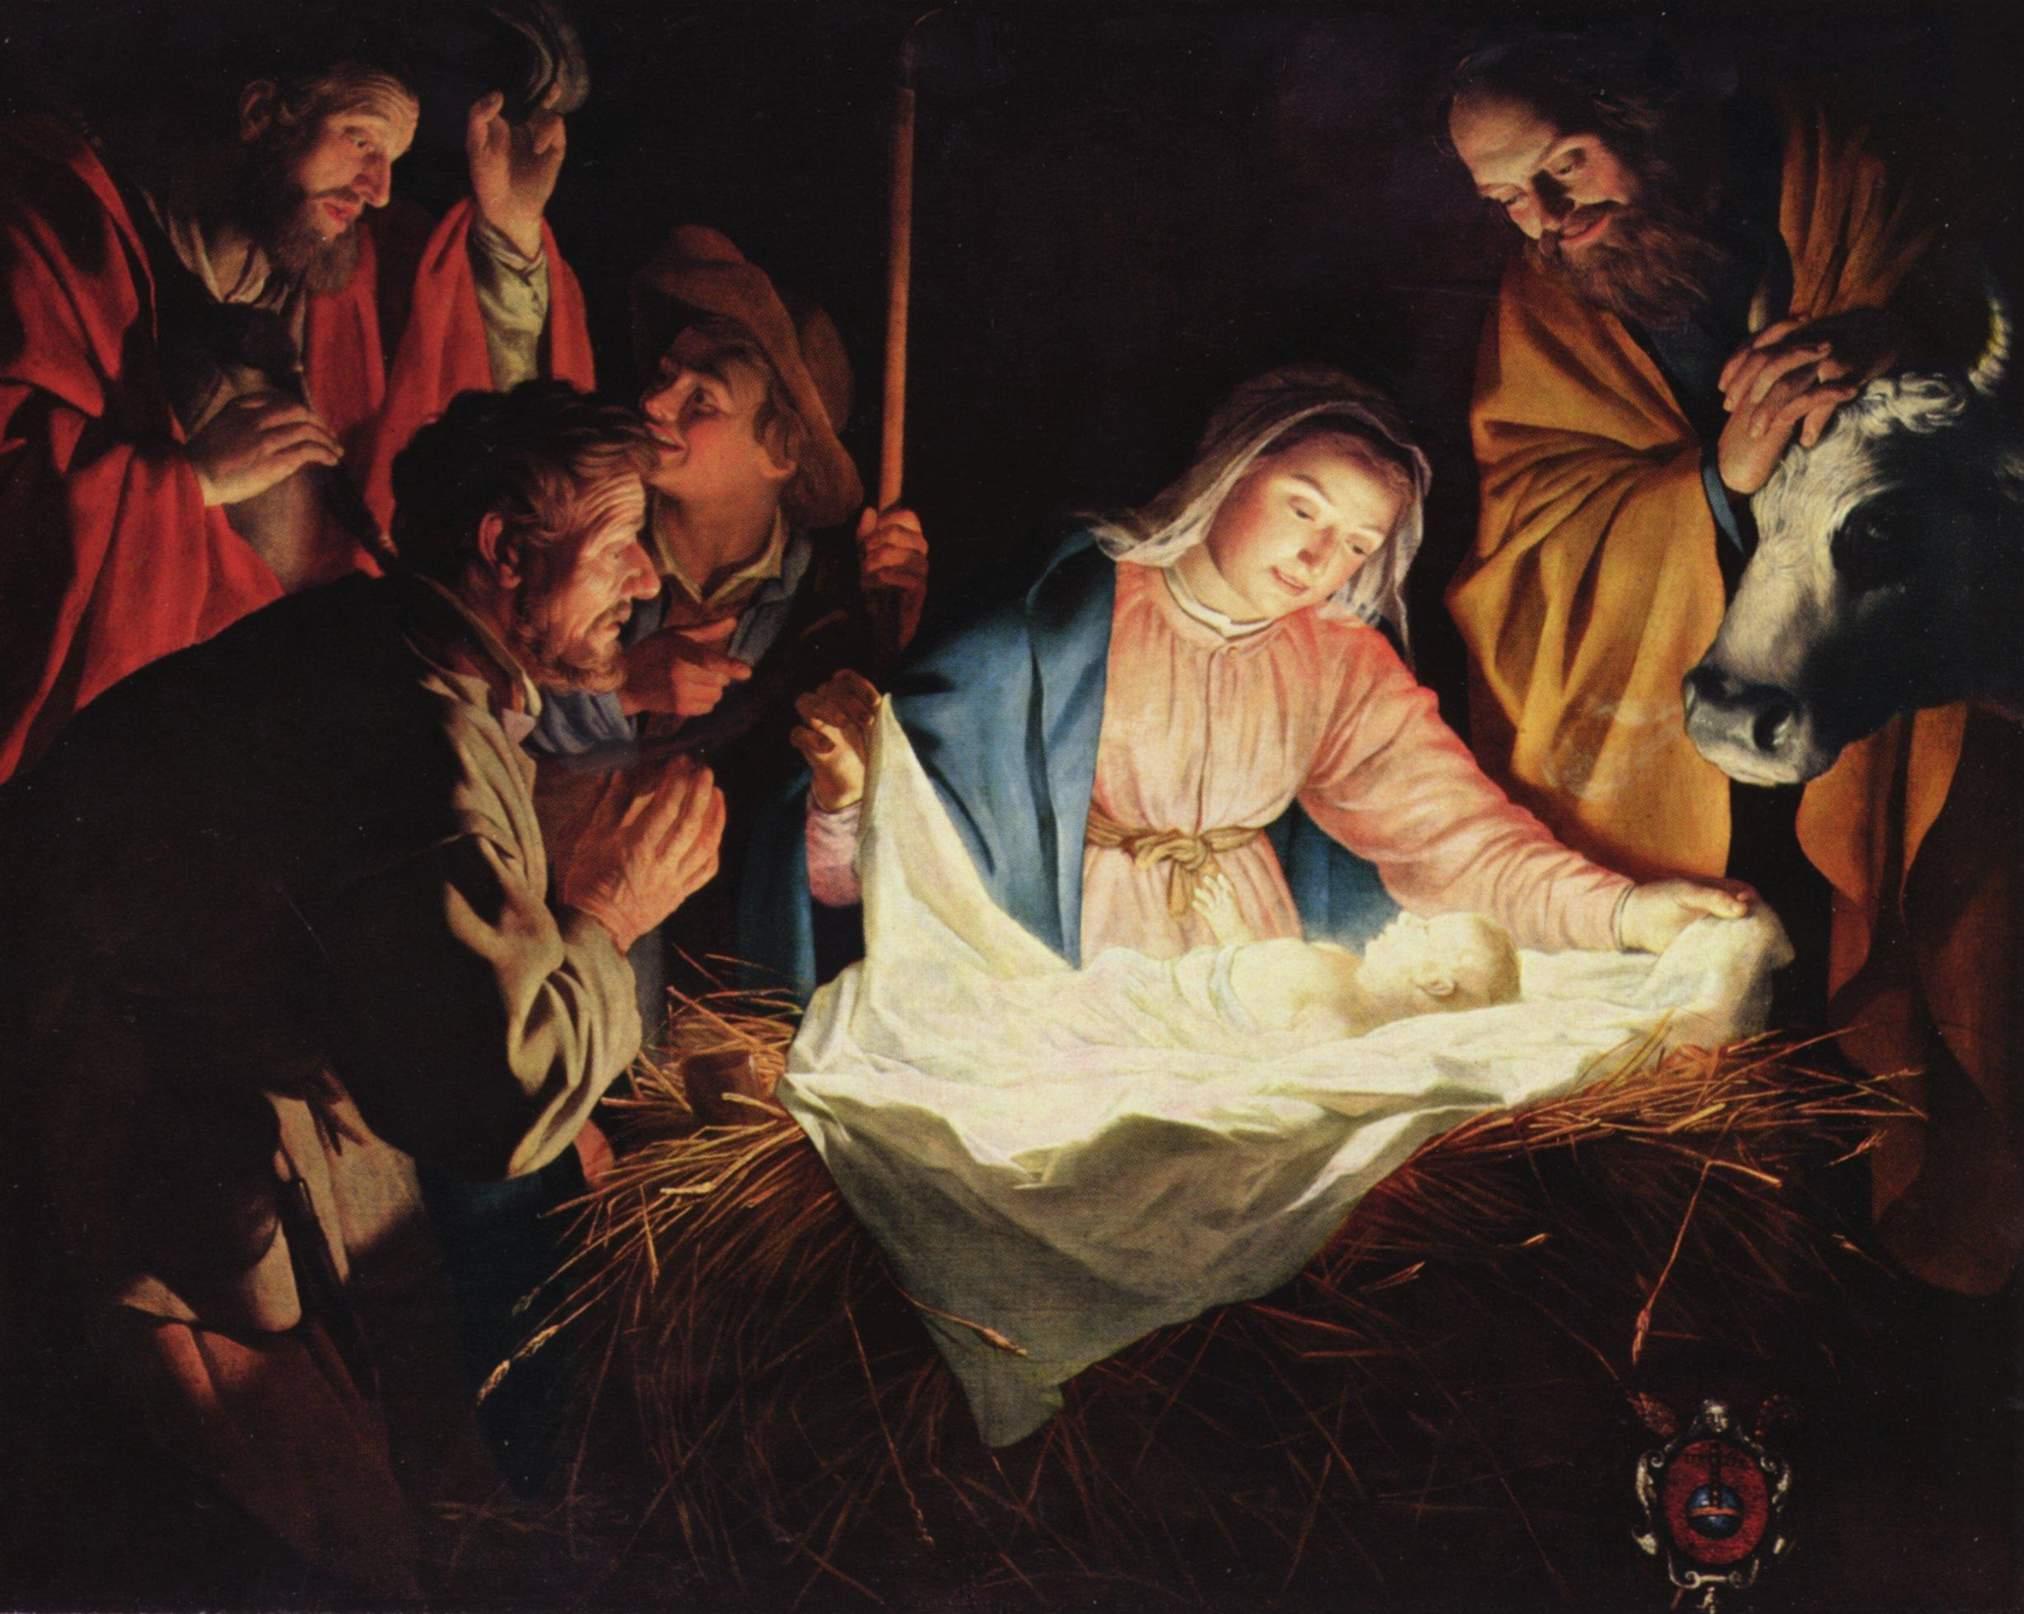 Gerard van Honthorst, Adoration of the Shepherds (1622)